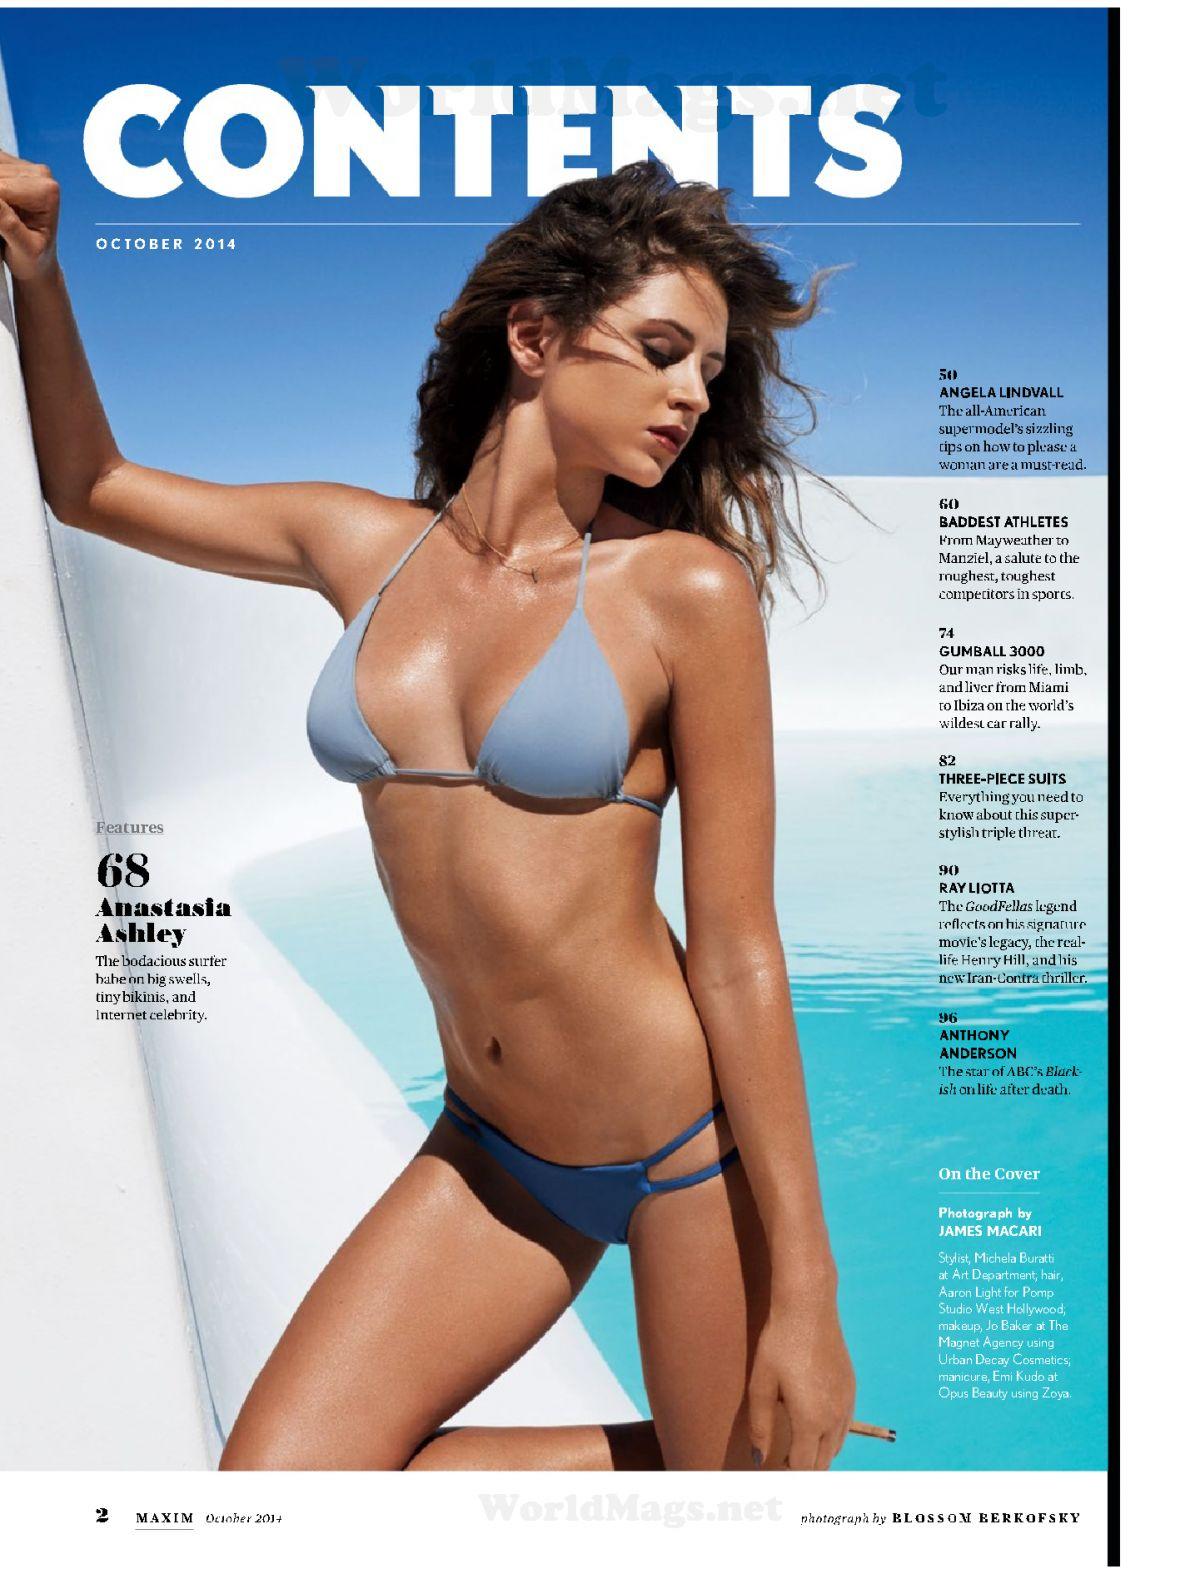 ANASTASIA ASHLEY in Maxim Magazine, October 2014 Issue